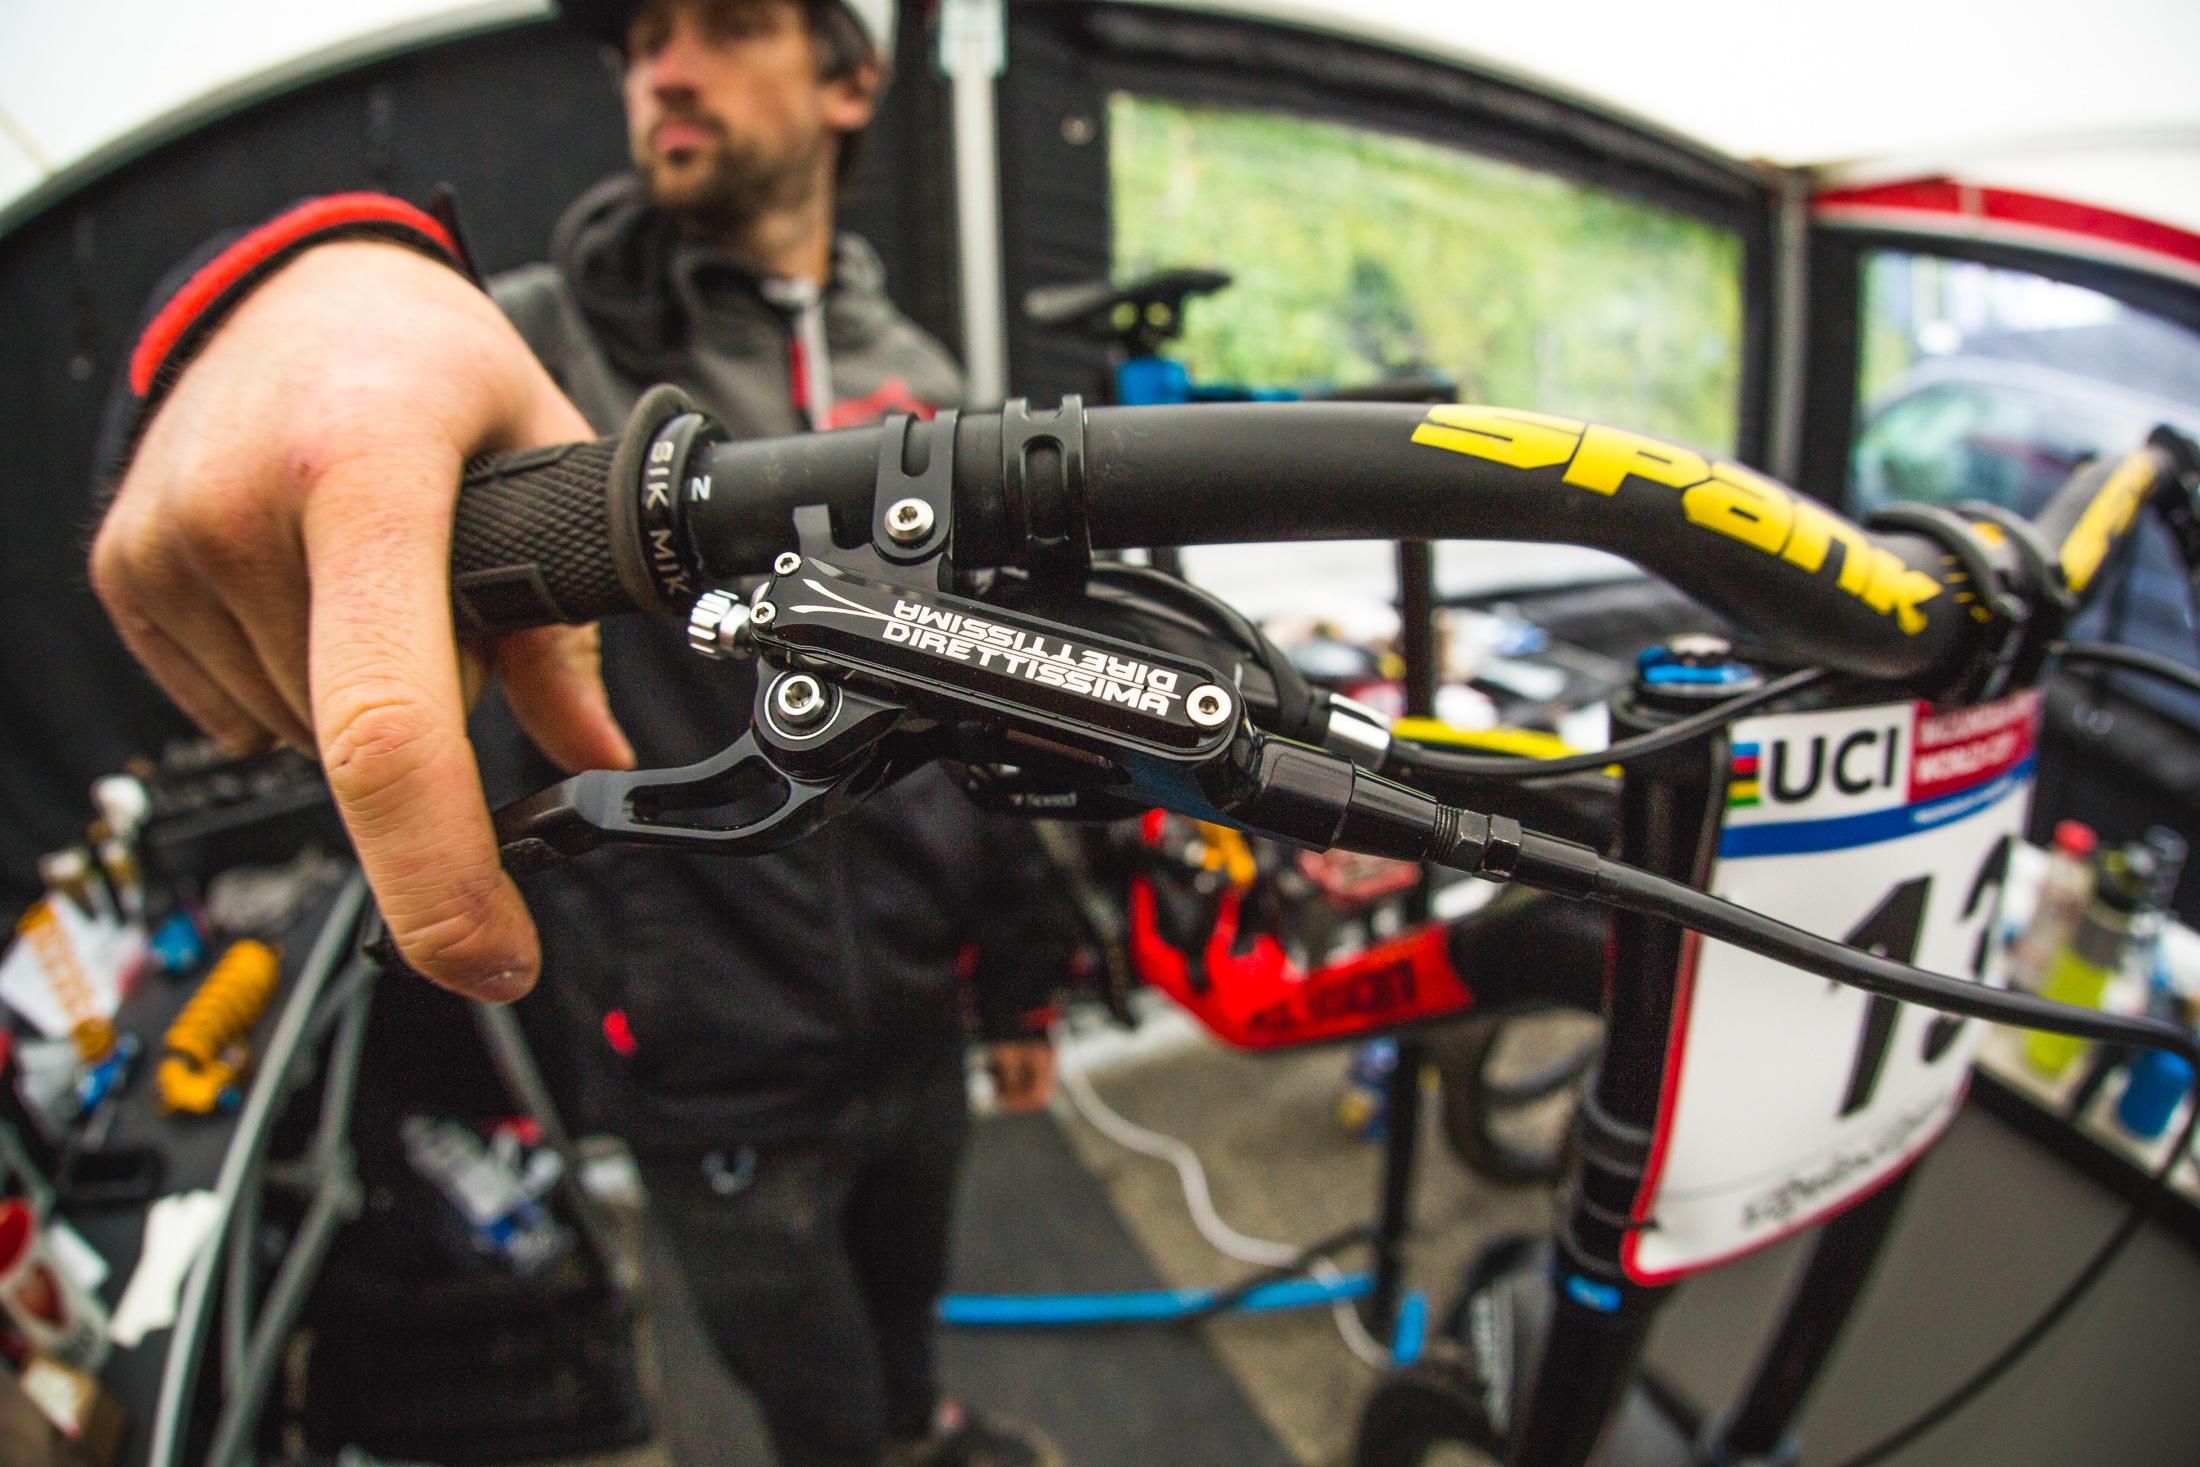 Jon Stout, Mick's Mechanic, models the grip-taped lever of the Direttissima.